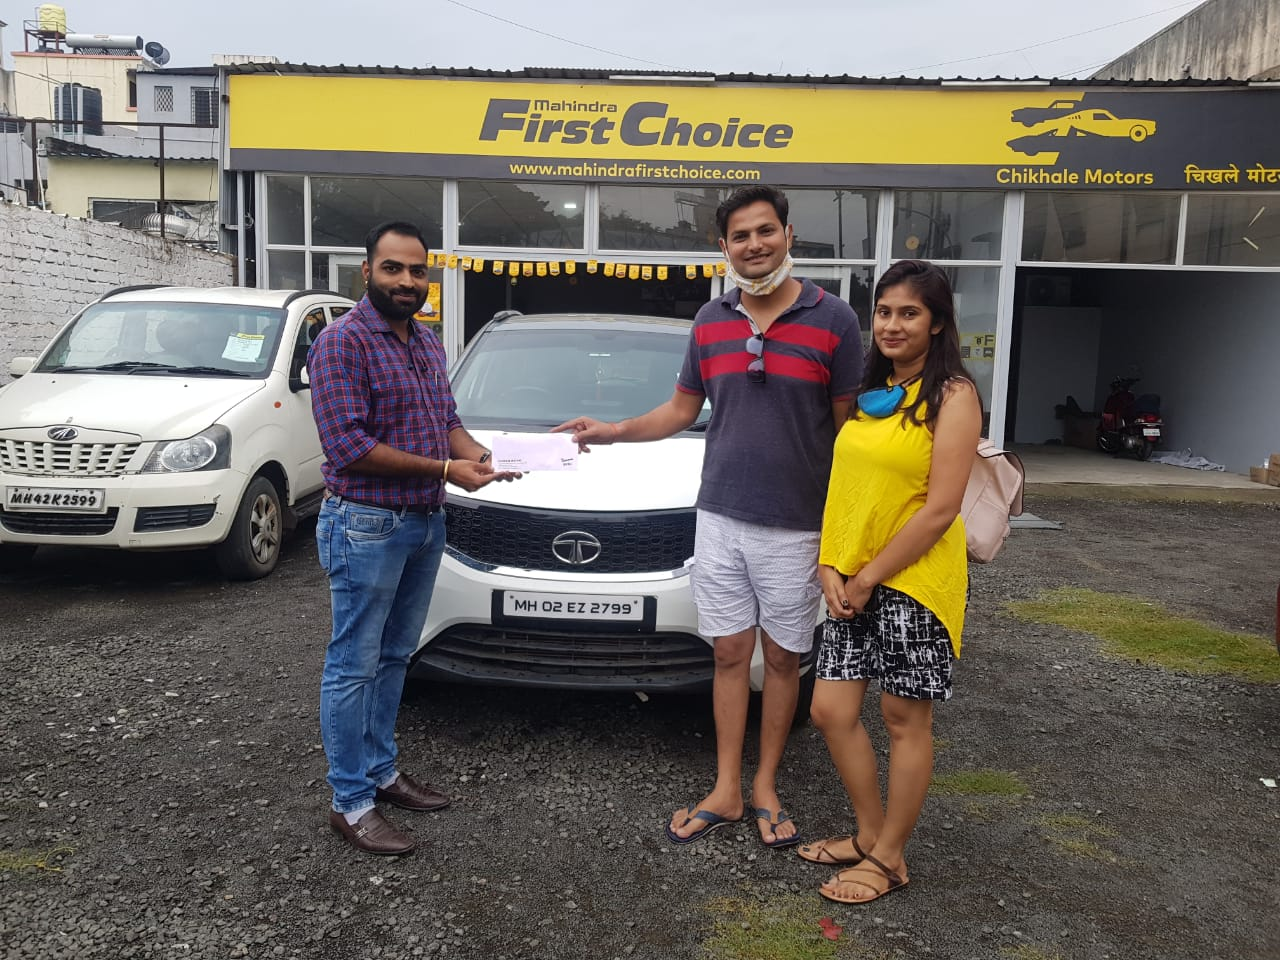 mahindra-first-choice-used-cars-6